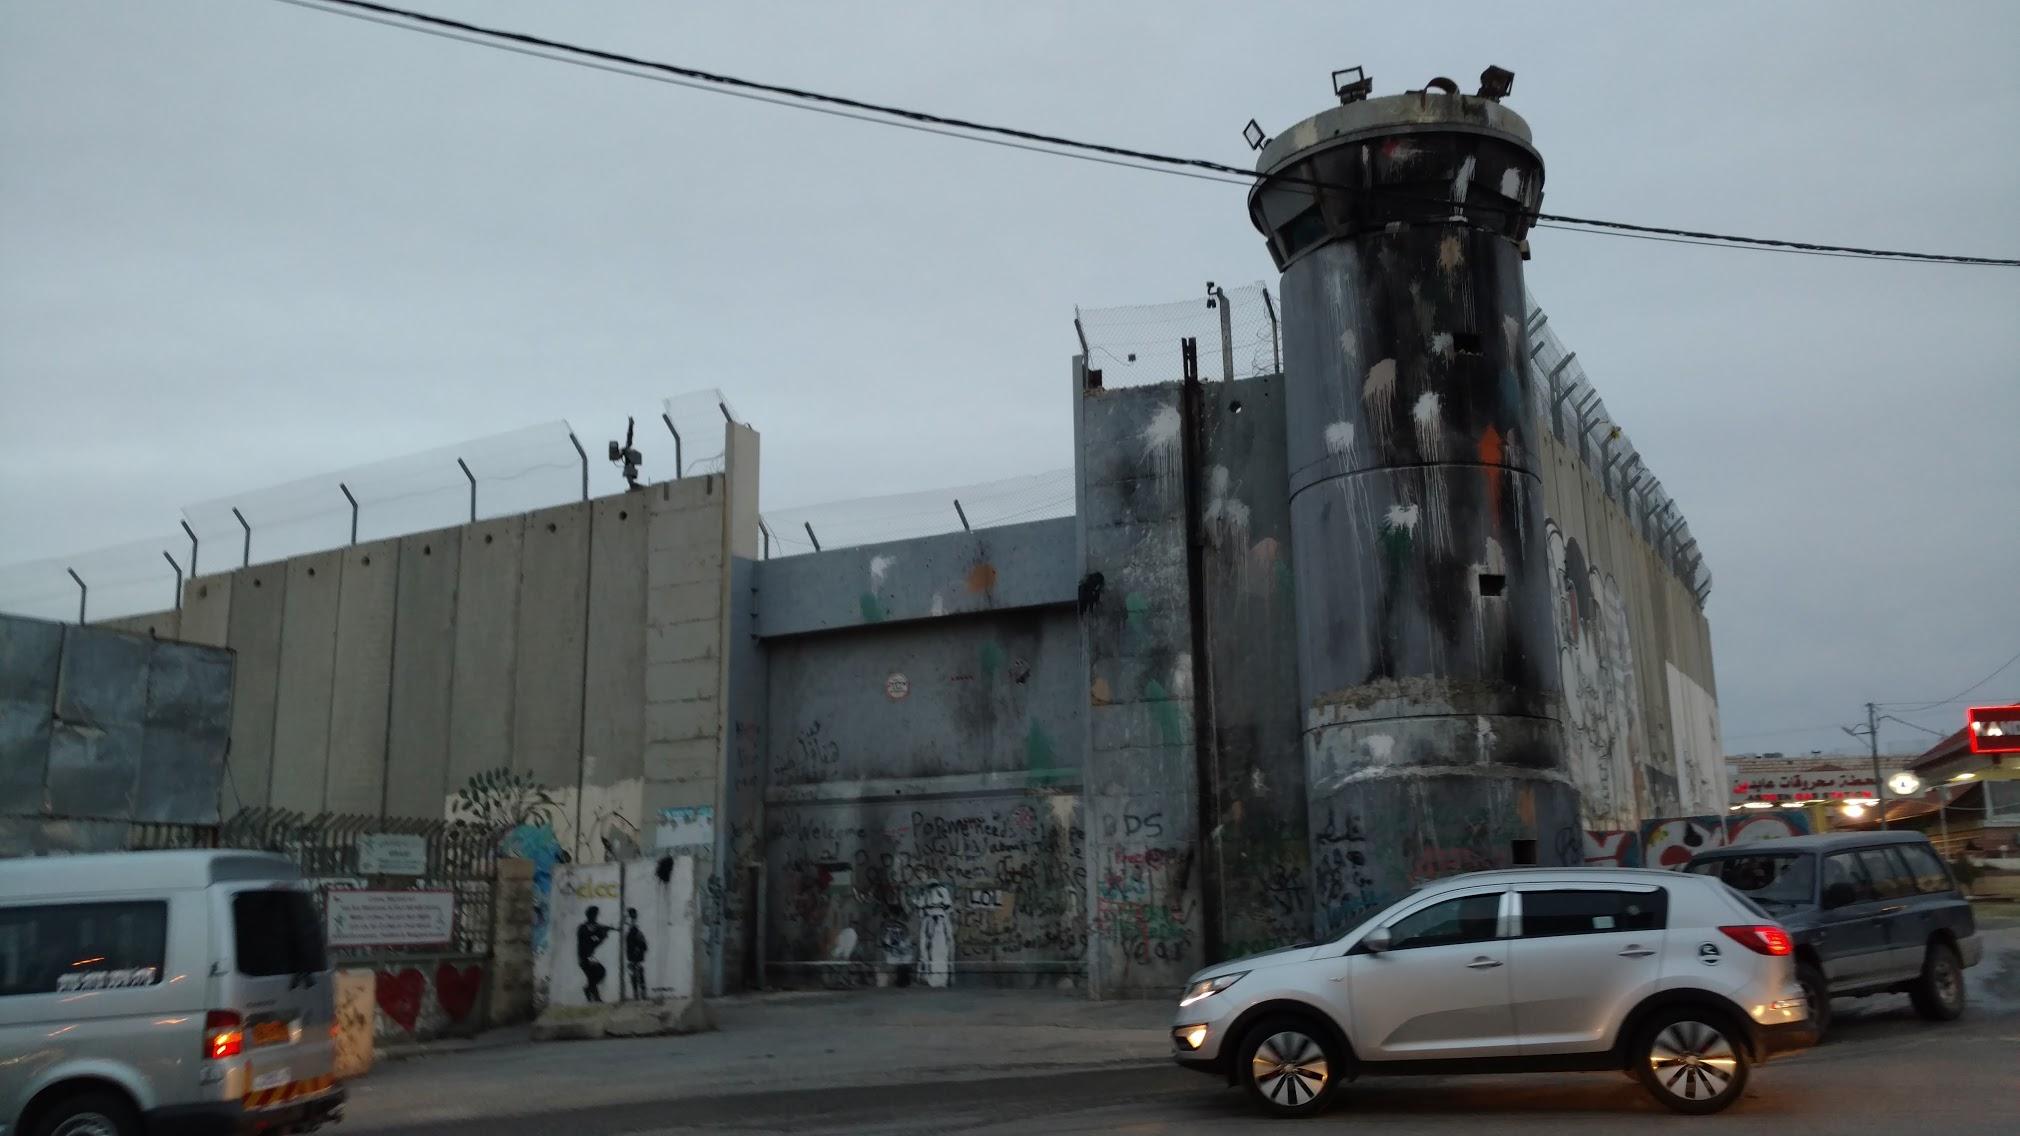 Figure 2  The wall outside Bethlehem  - with Banksy artwork